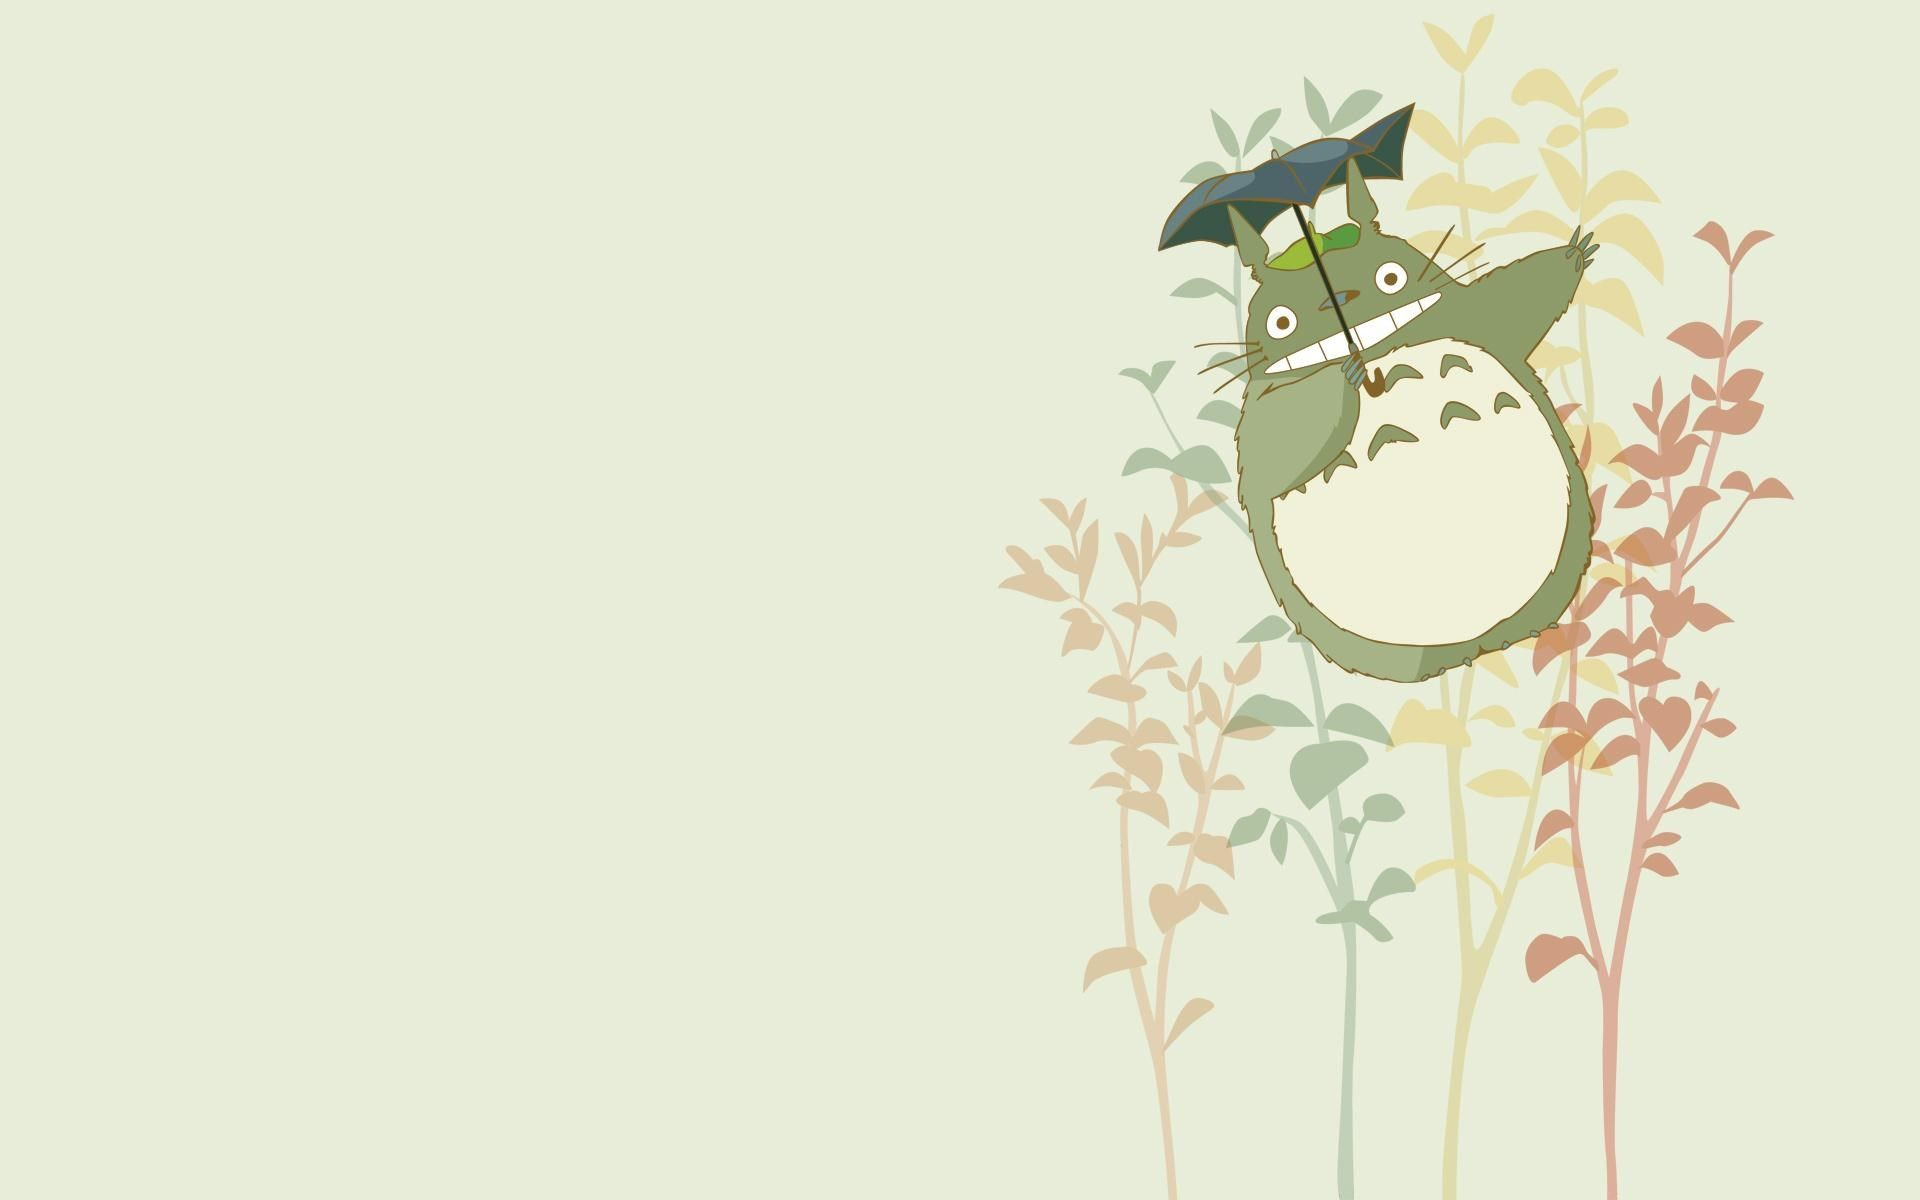 totoro anime wallpapers hd free o oshenka Pinterest